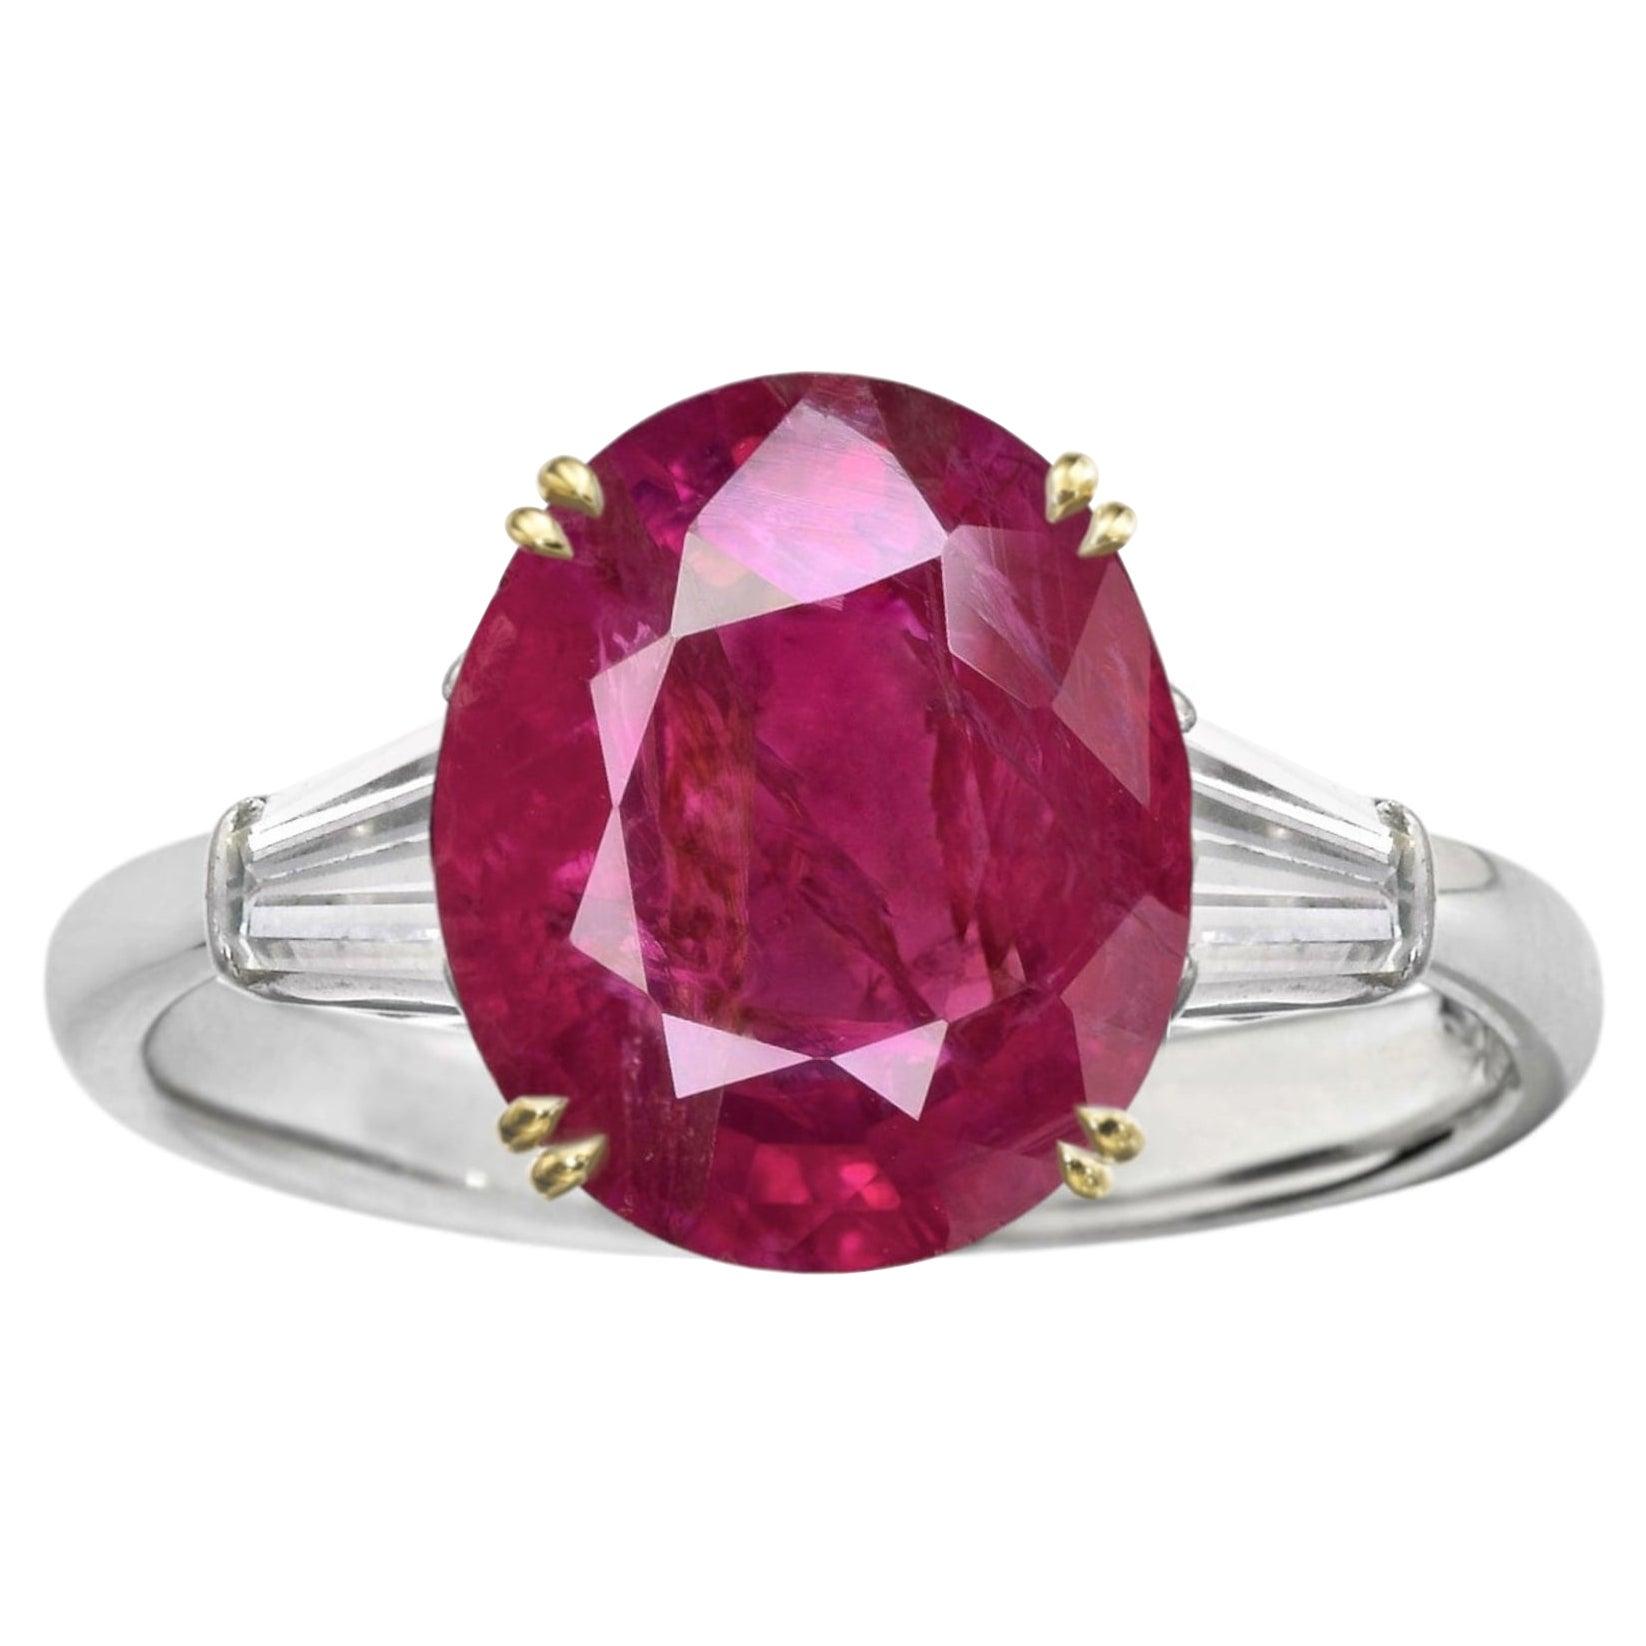 Burma Red No Heat Cushion Cut 4.50 Carat Ruby Diamond Ring